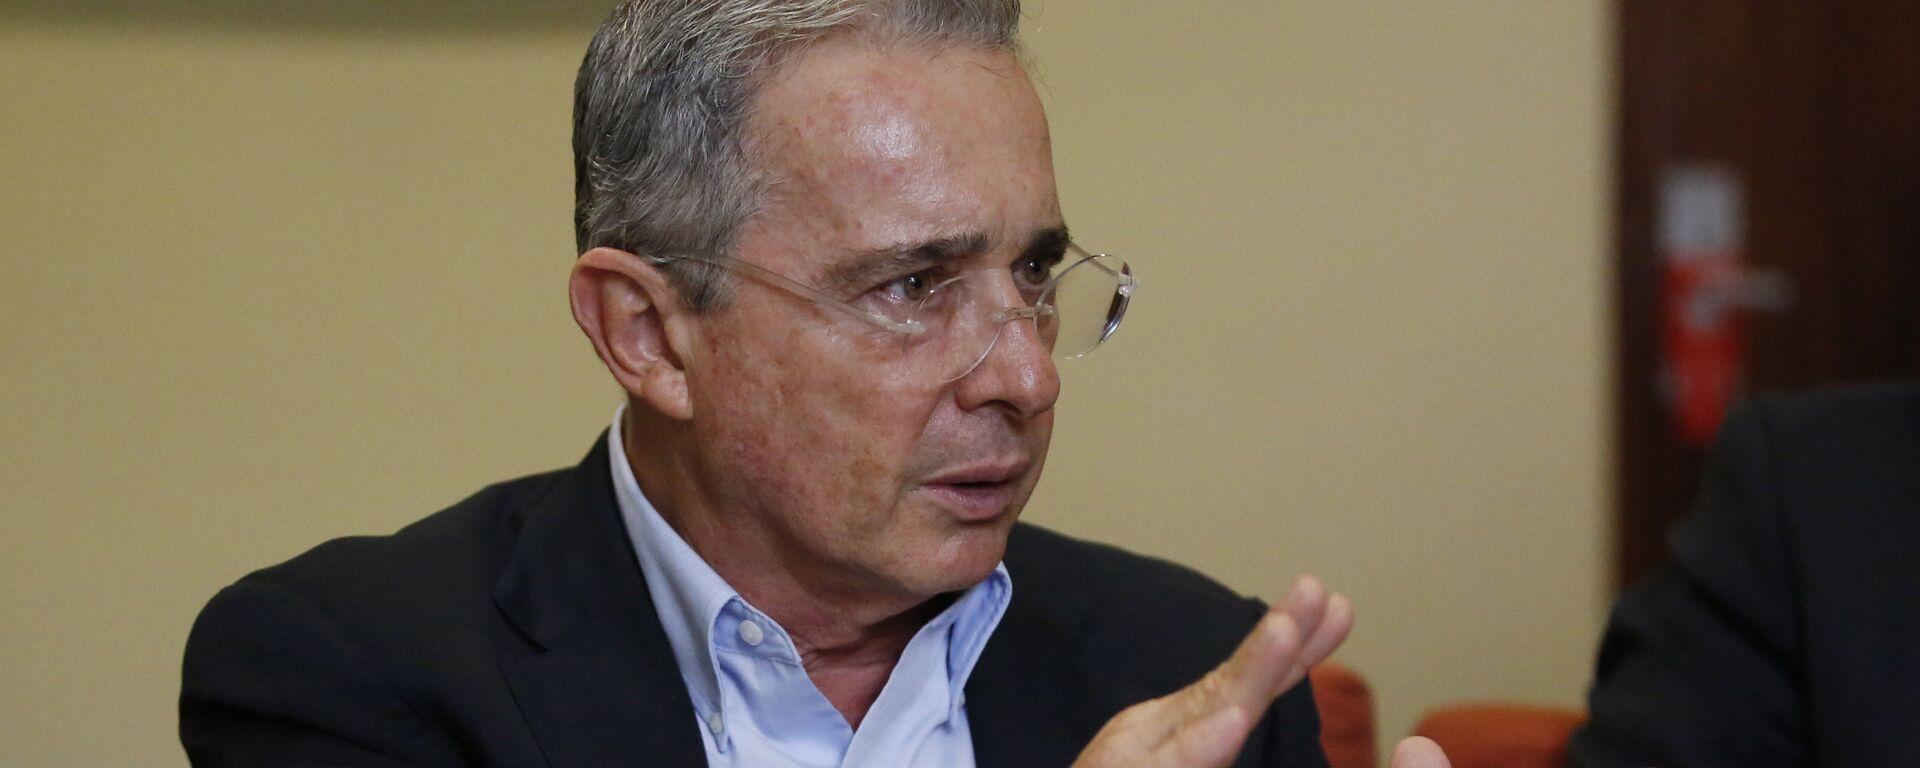 Álvaro Uribe Vélez, expresidente de Colombia - Sputnik Mundo, 1920, 05.03.2021